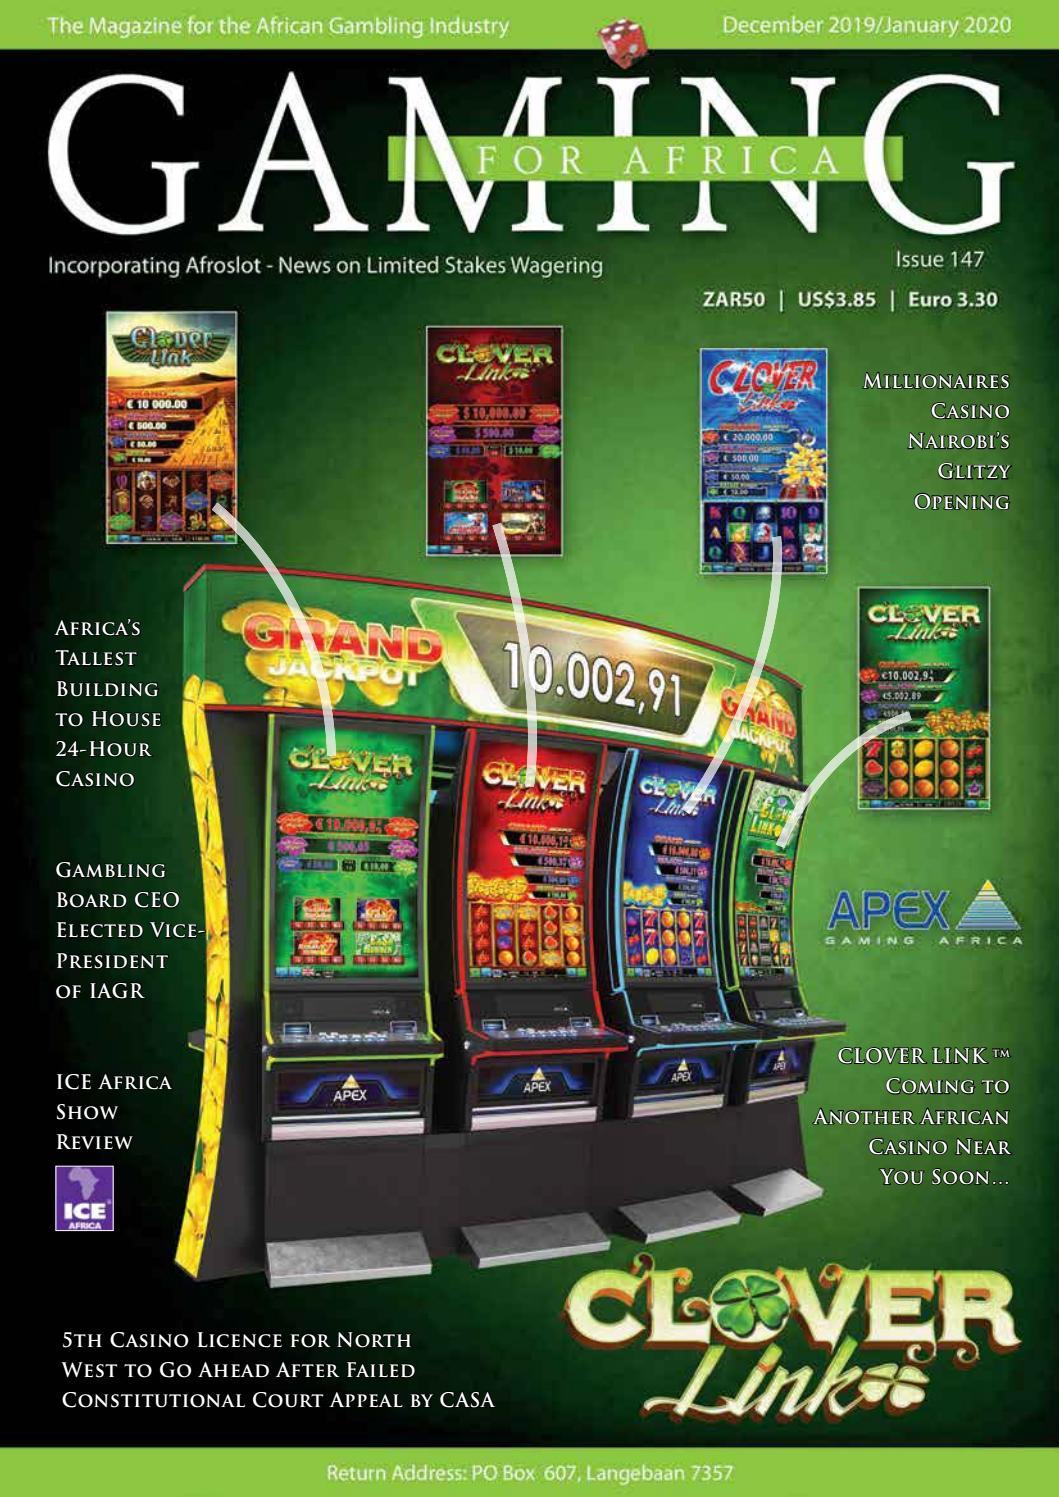 4 aces casino nairobi stuart little 2 free online games